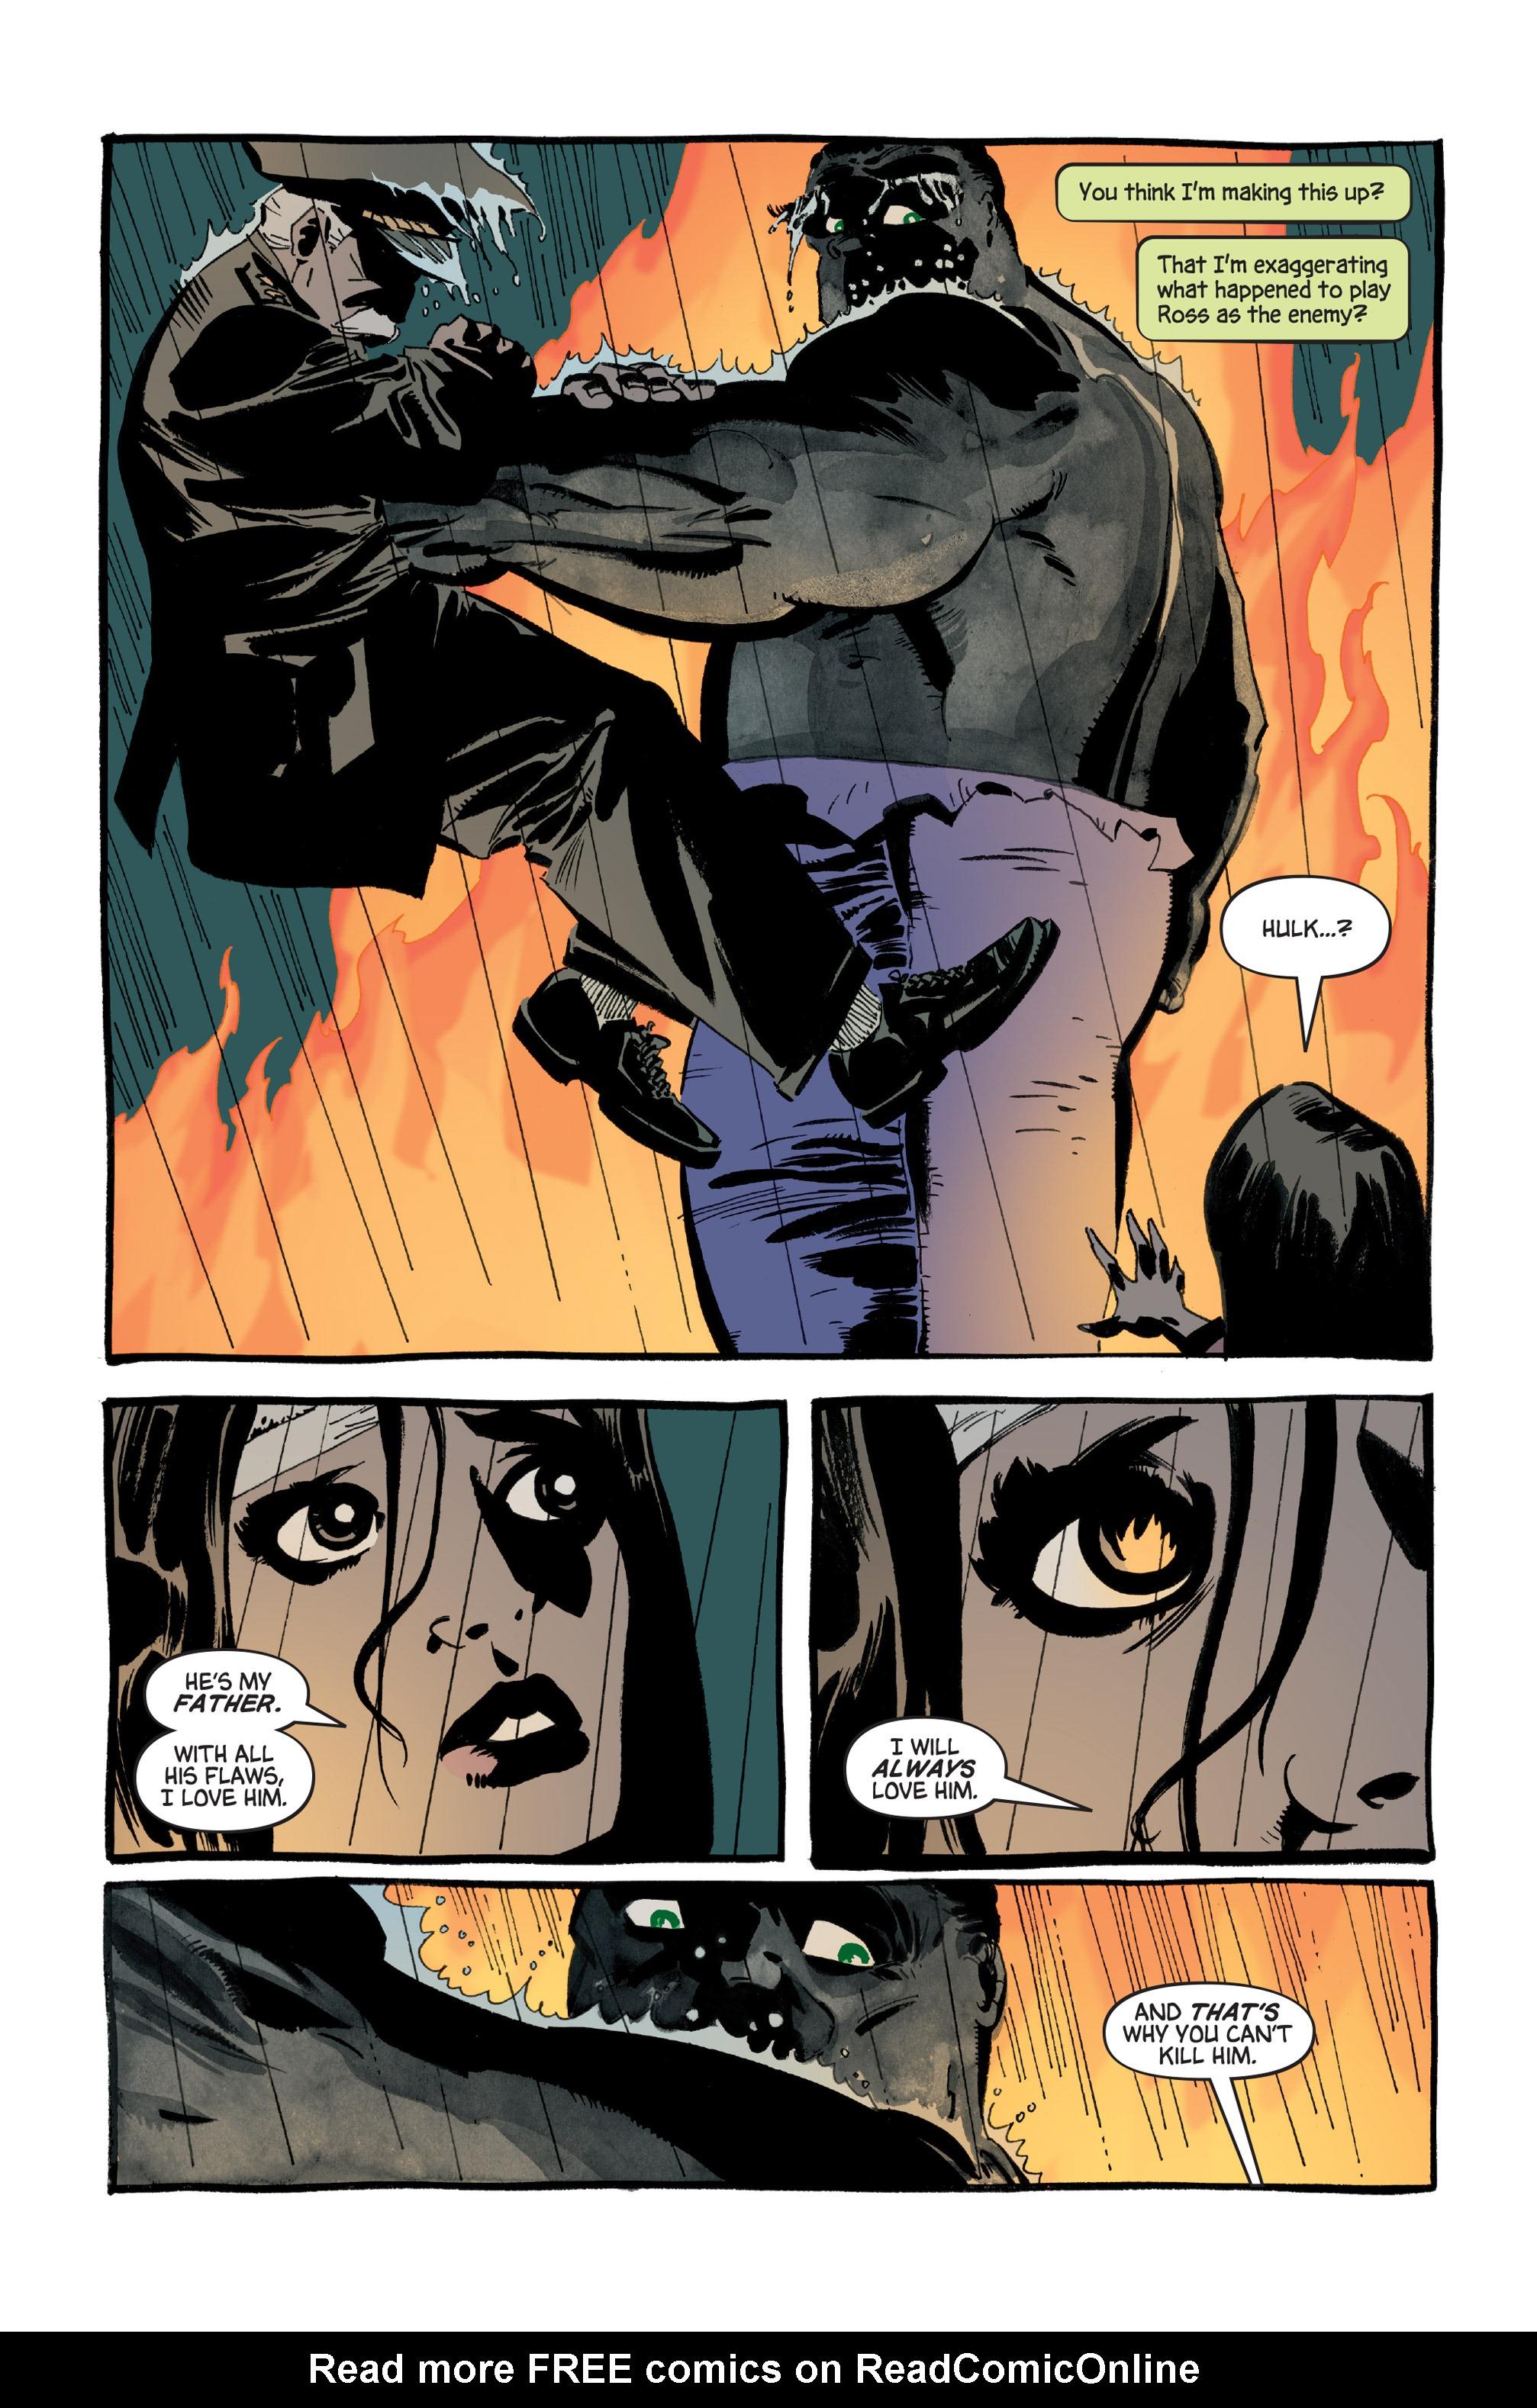 Read online Hulk: Gray comic -  Issue #6 - 15